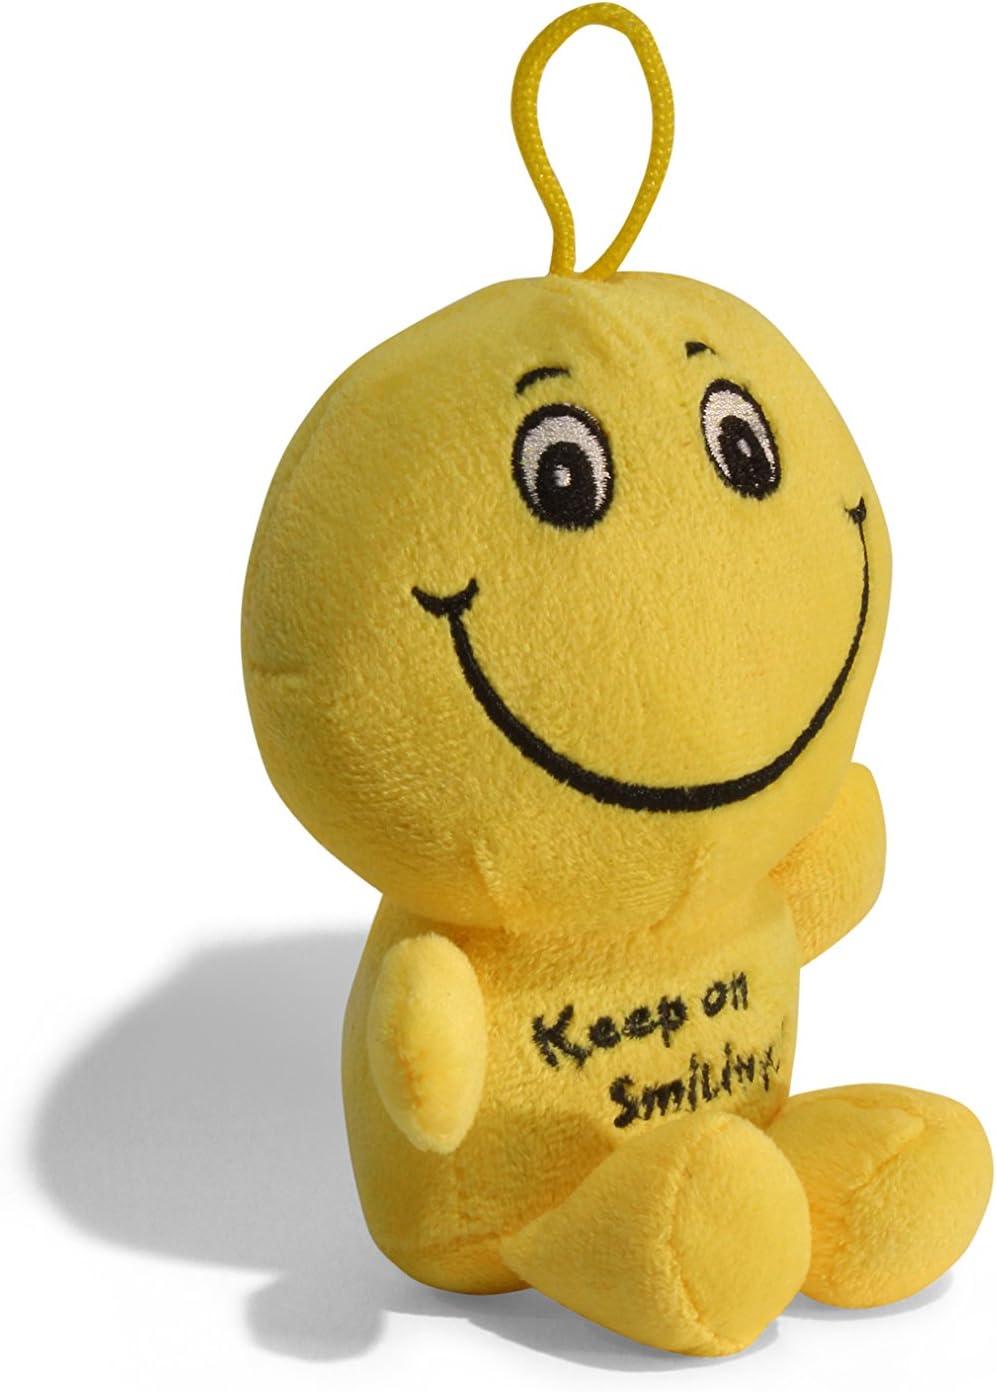 Bussi smiley PTL Tammy